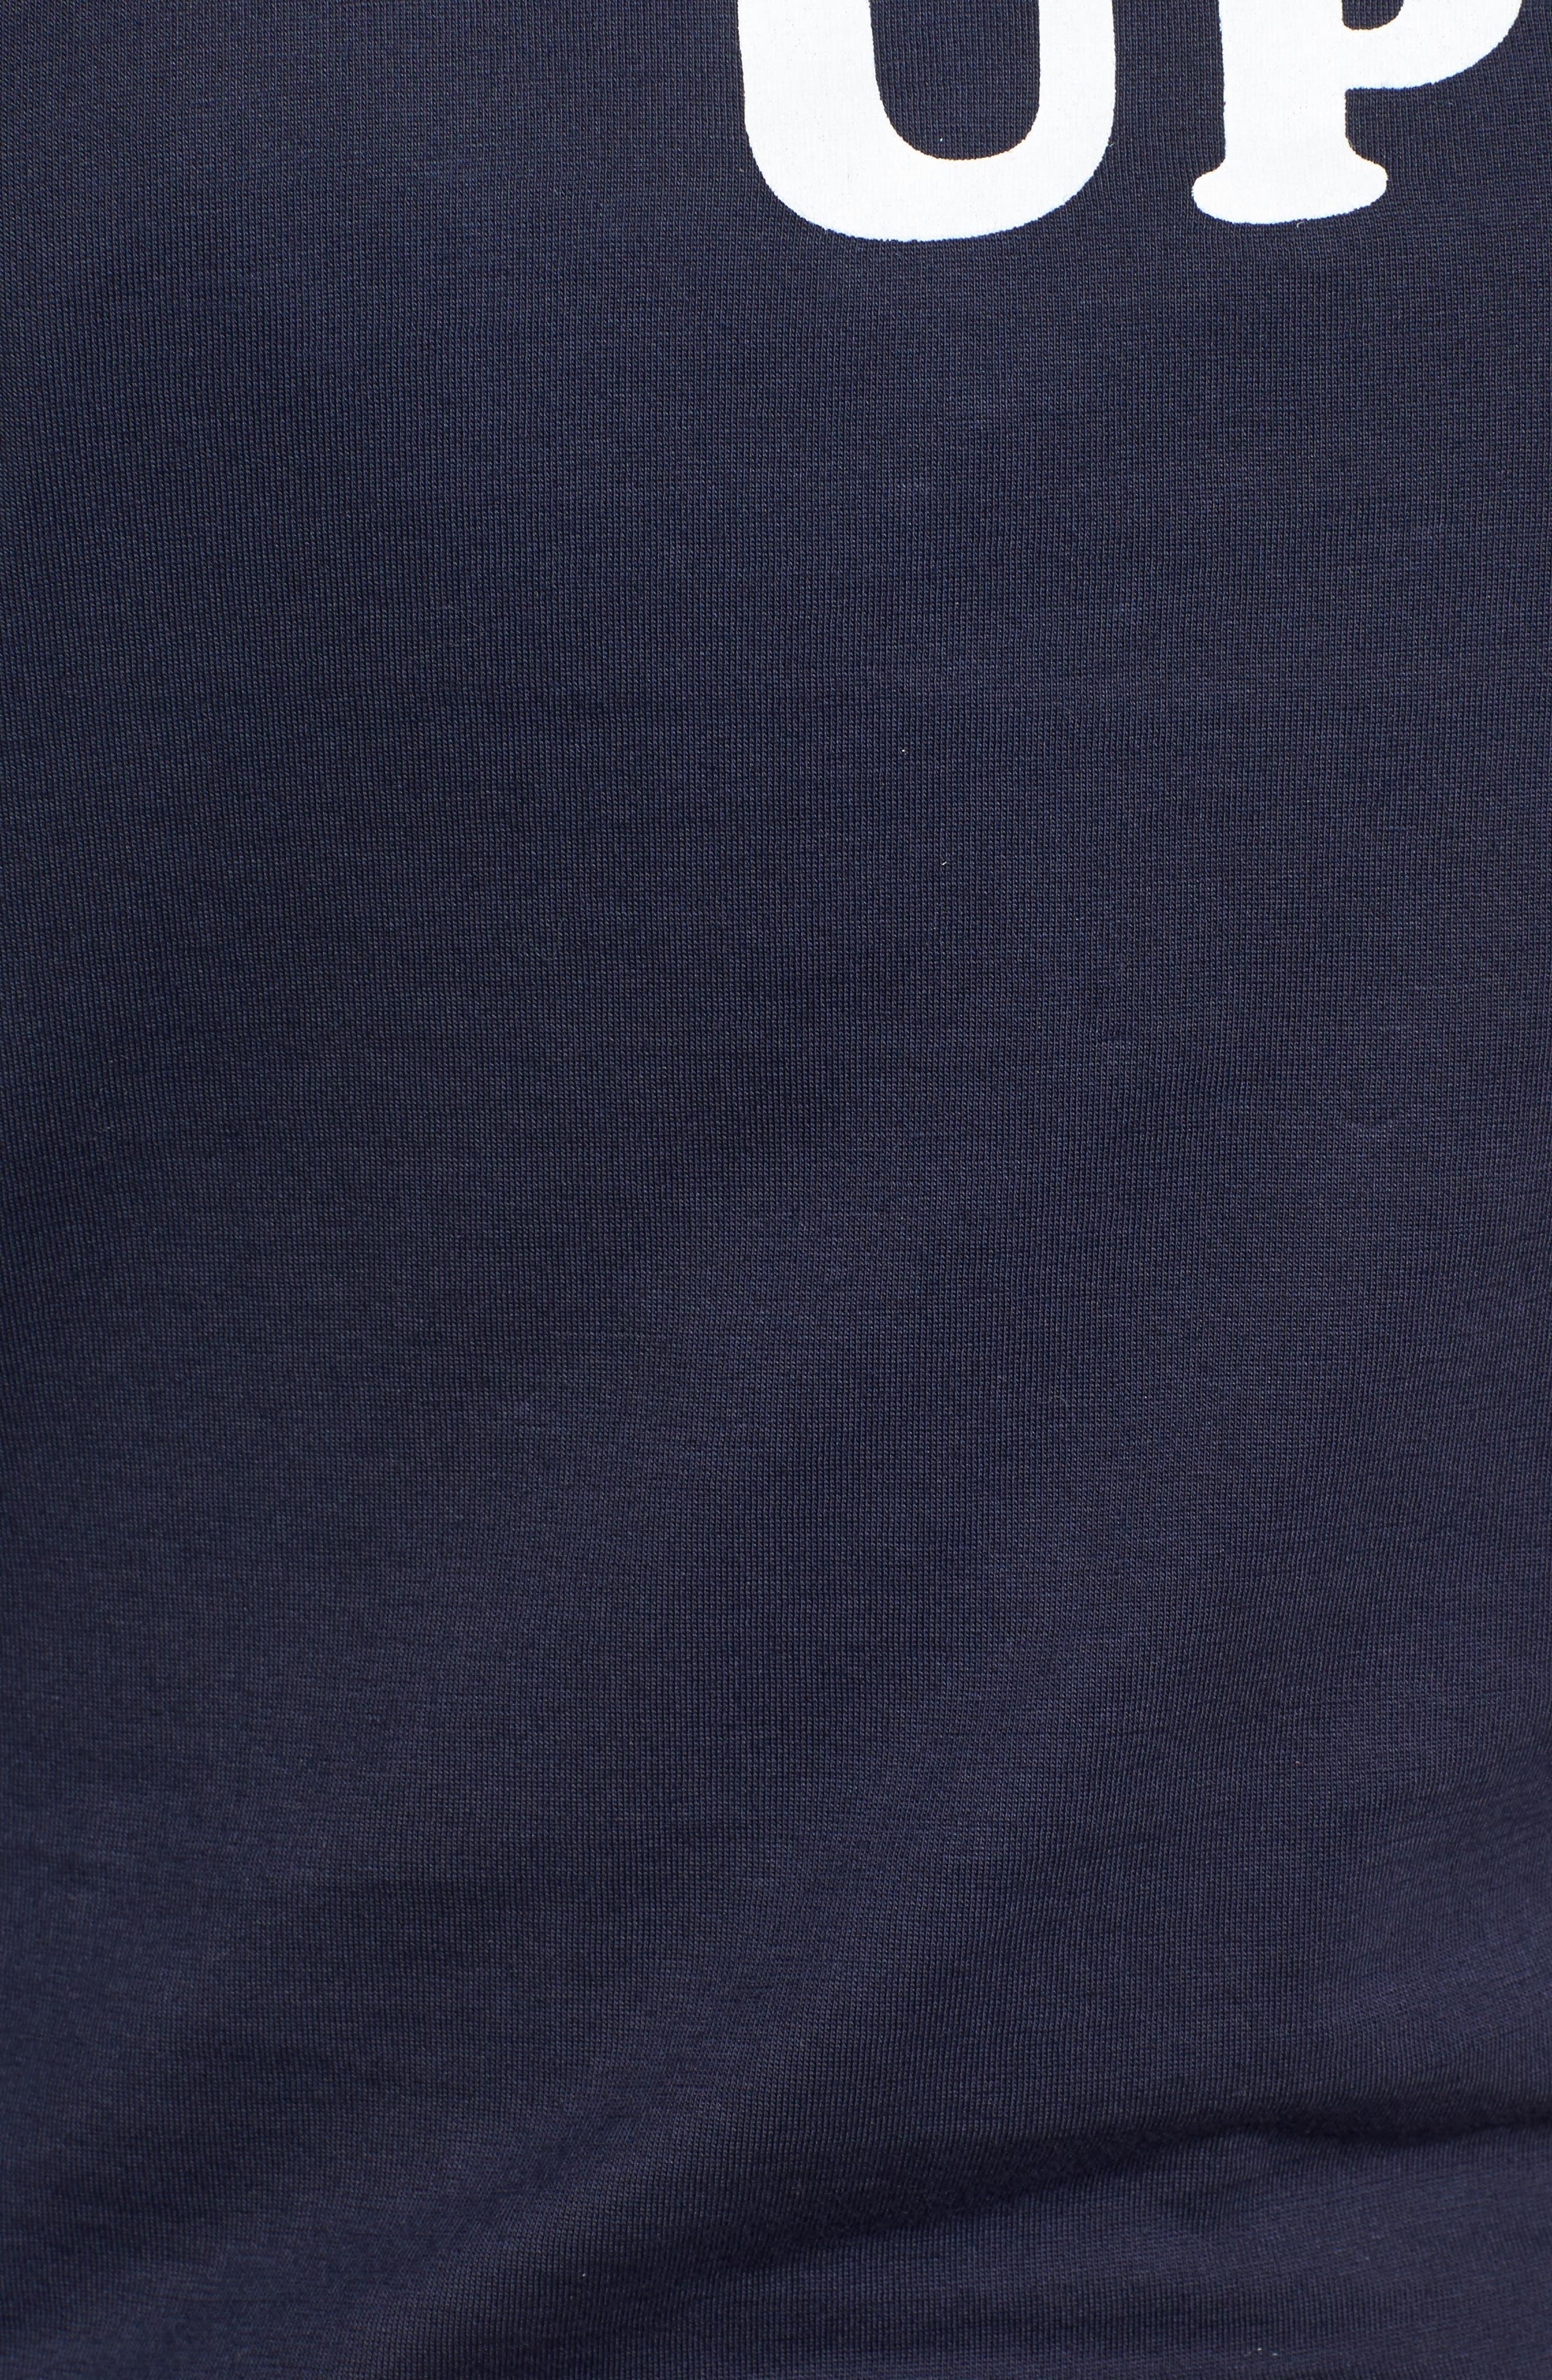 Short Sleeve Cotton Tee,                             Alternate thumbnail 59, color,